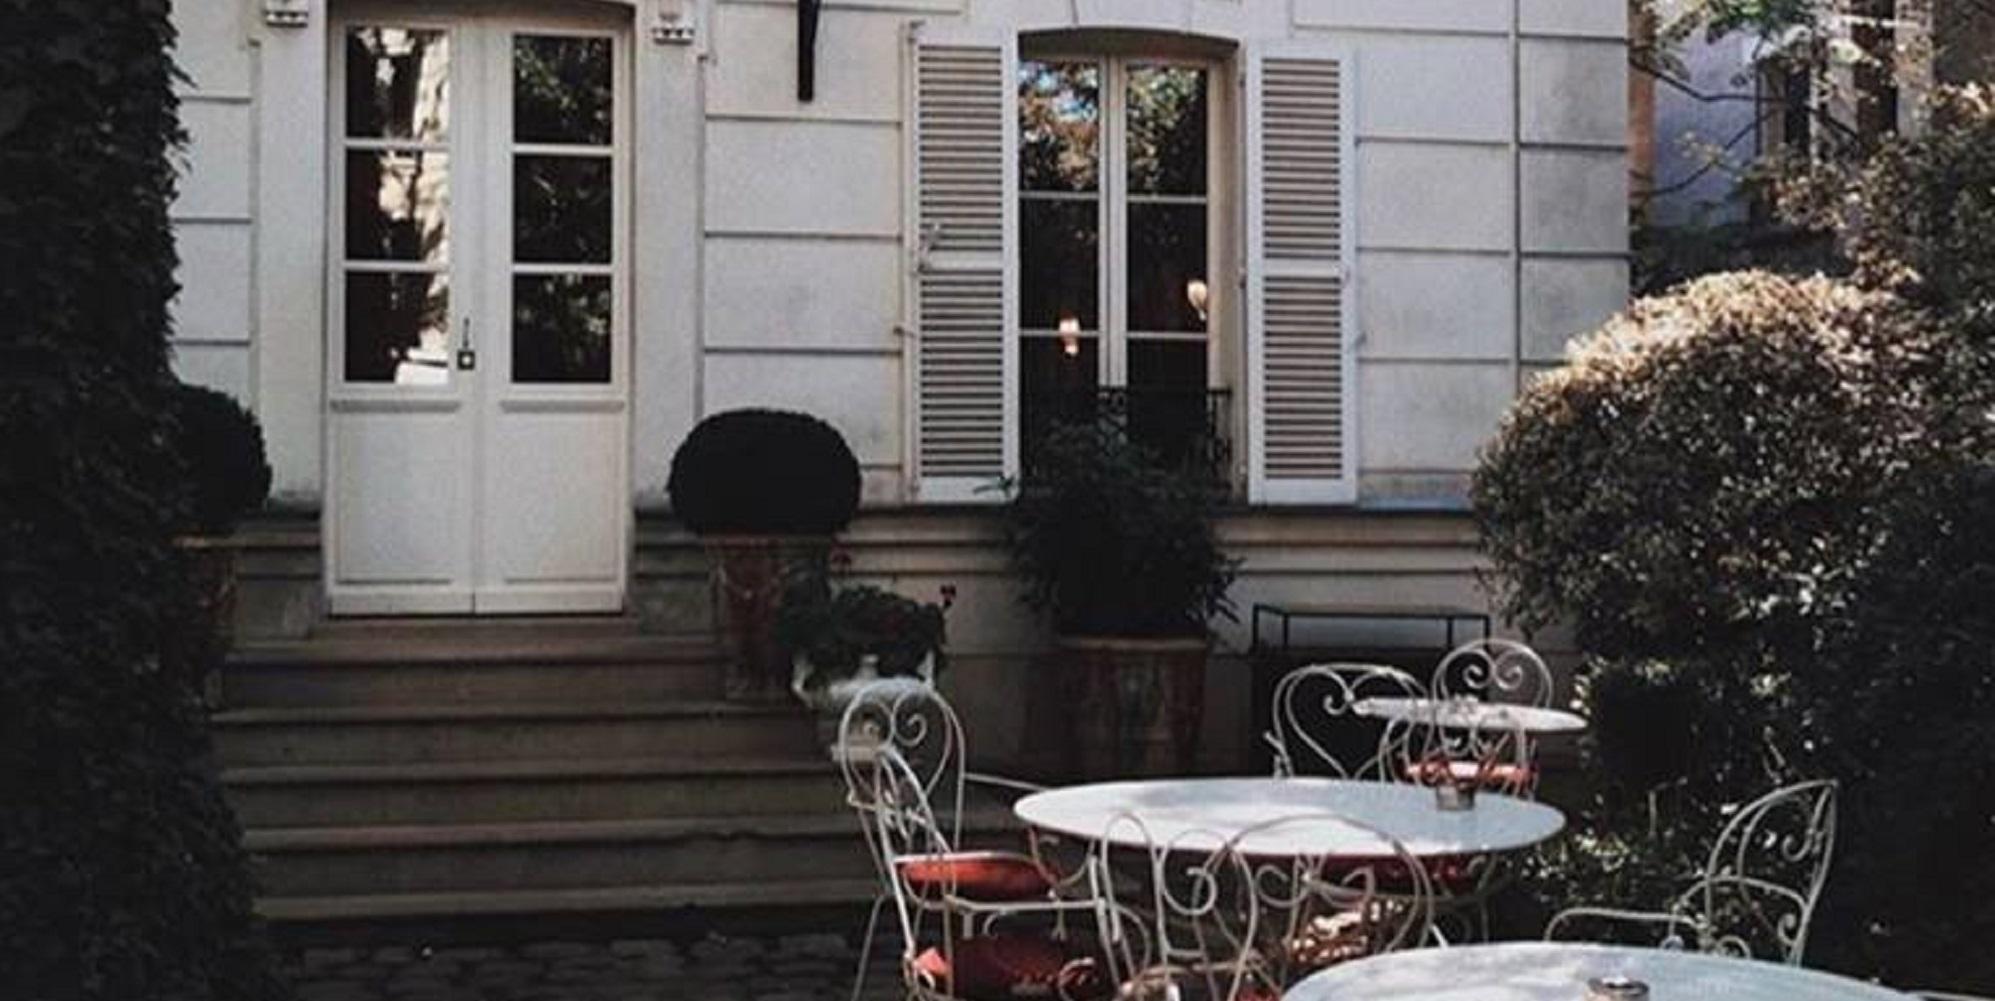 Brunch Hotel Particulier 75018 Paris Oubruncher